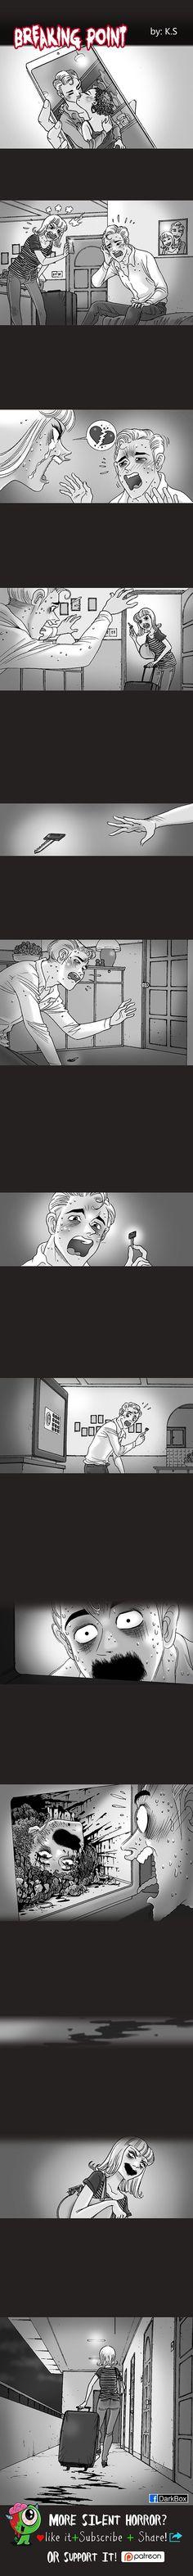 Dark Box is creating Silent Horror Silent Horror Comics, Scary Comics, Funny Comics, Short Horror Stories, Creepy Stories, Creepypasta, Rage Comic, Horror Art, Weird